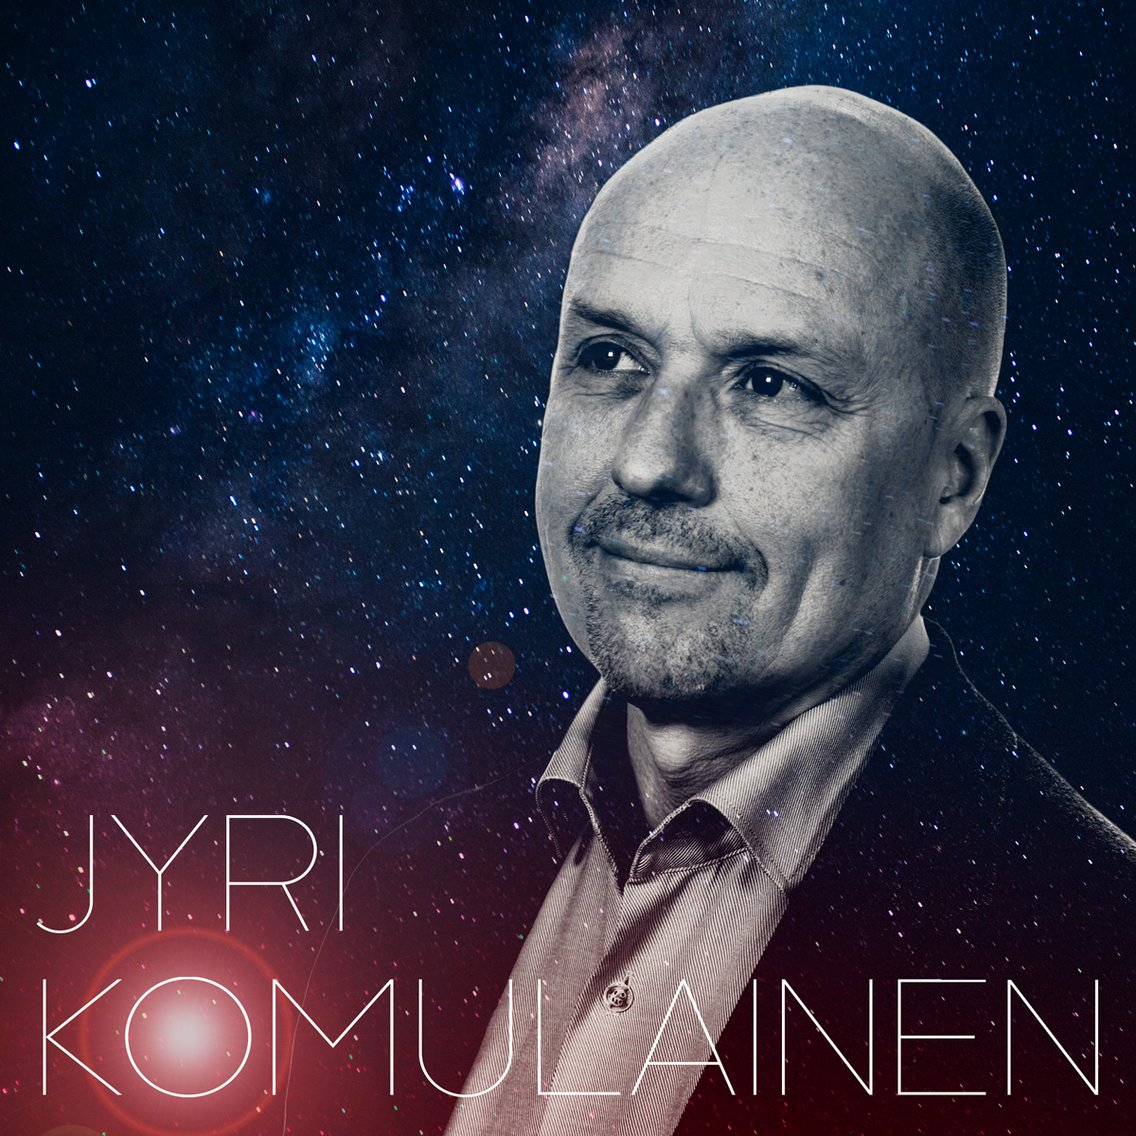 Jyri Komulainen - Cover Image